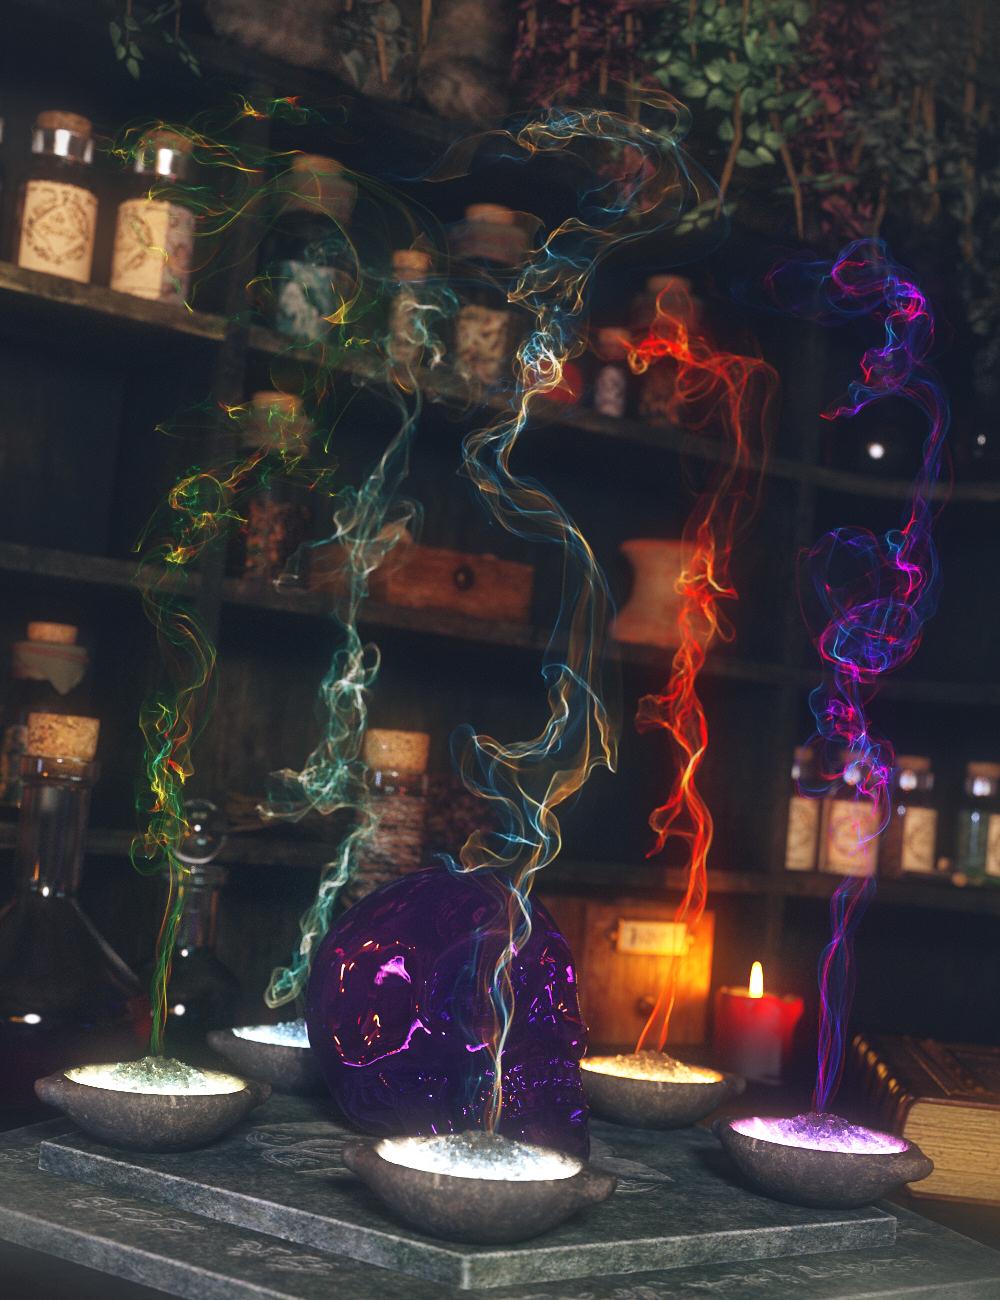 MMX Smoke Trails 2 for Iray by: Mattymanx, 3D Models by Daz 3D